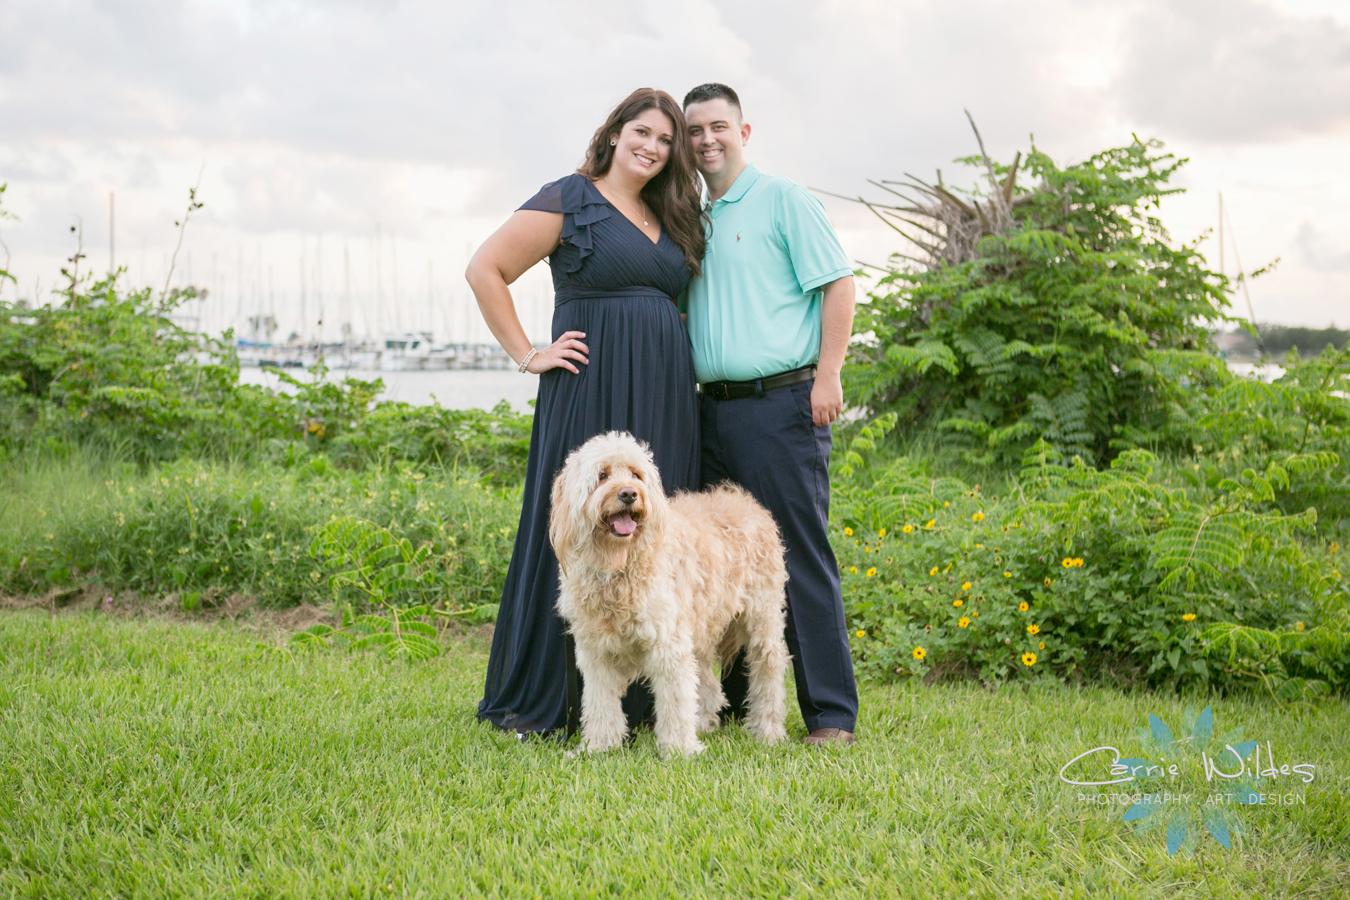 6_22_18 Julie and Charlie Tampa Engagement Session 008.jpg